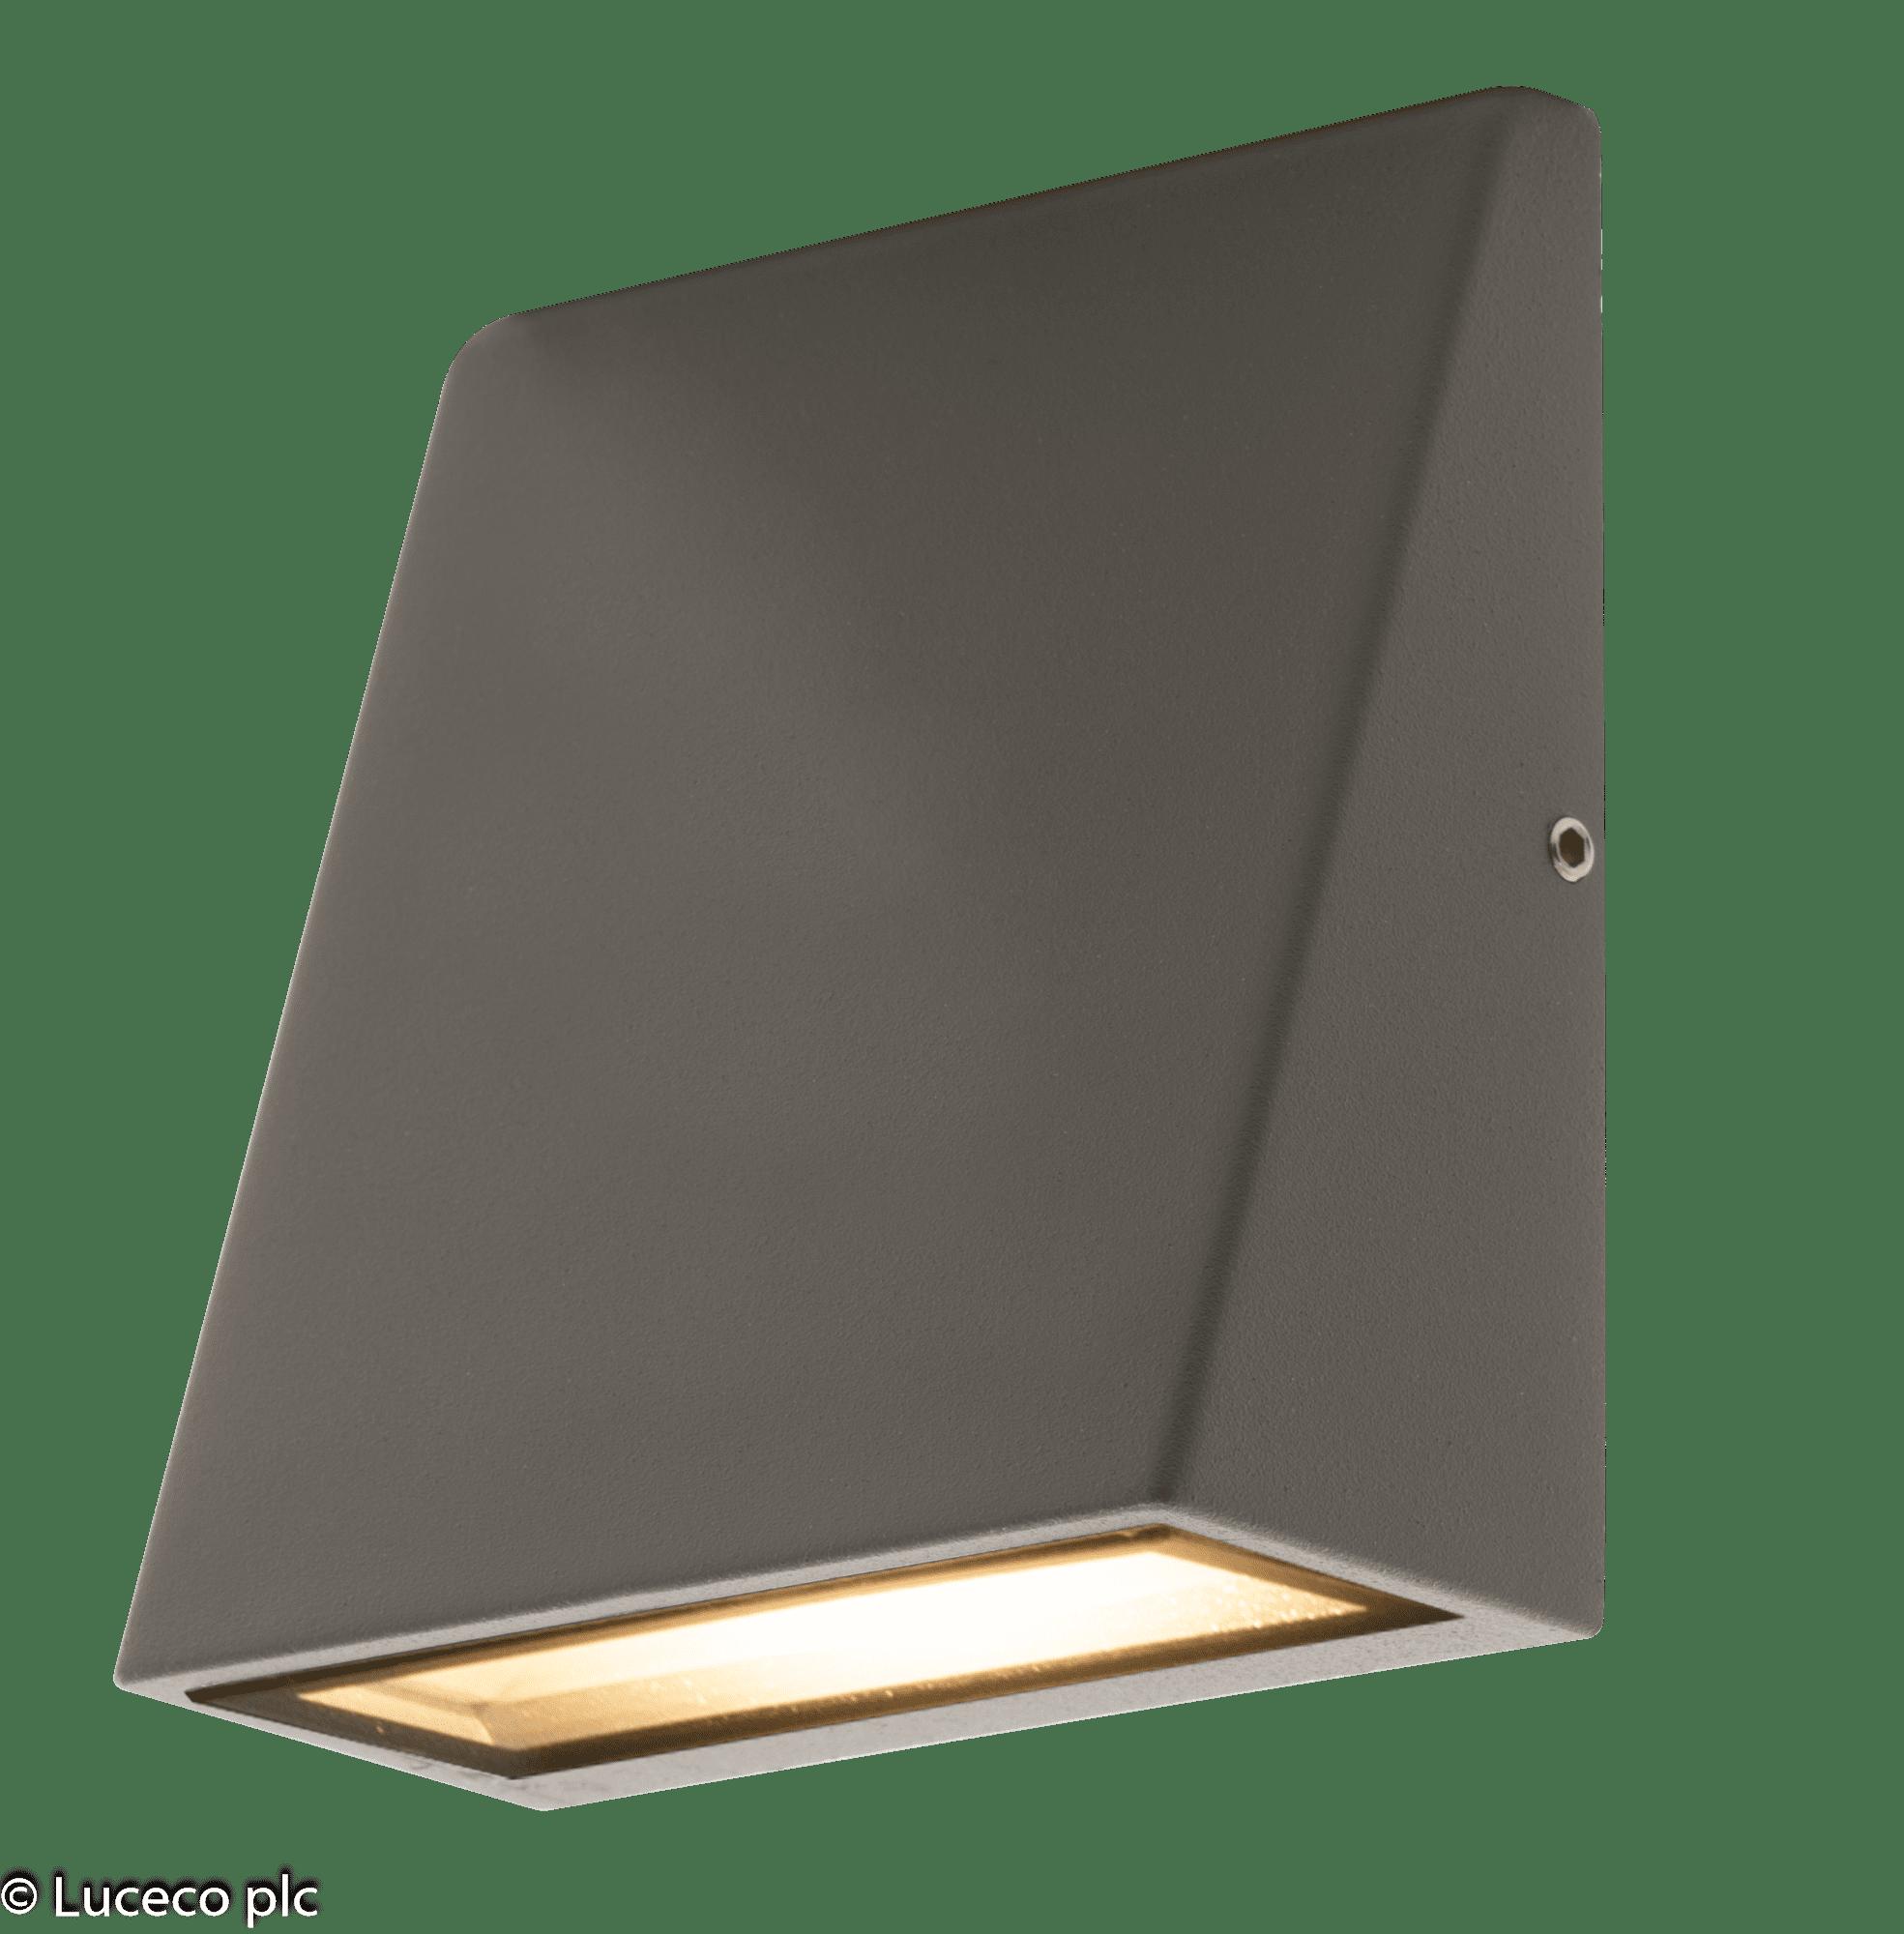 Luceco Dekorative LED Wand-Außenleuchte warmweiß 3W 120lm 3000K #LEXD3WDG3